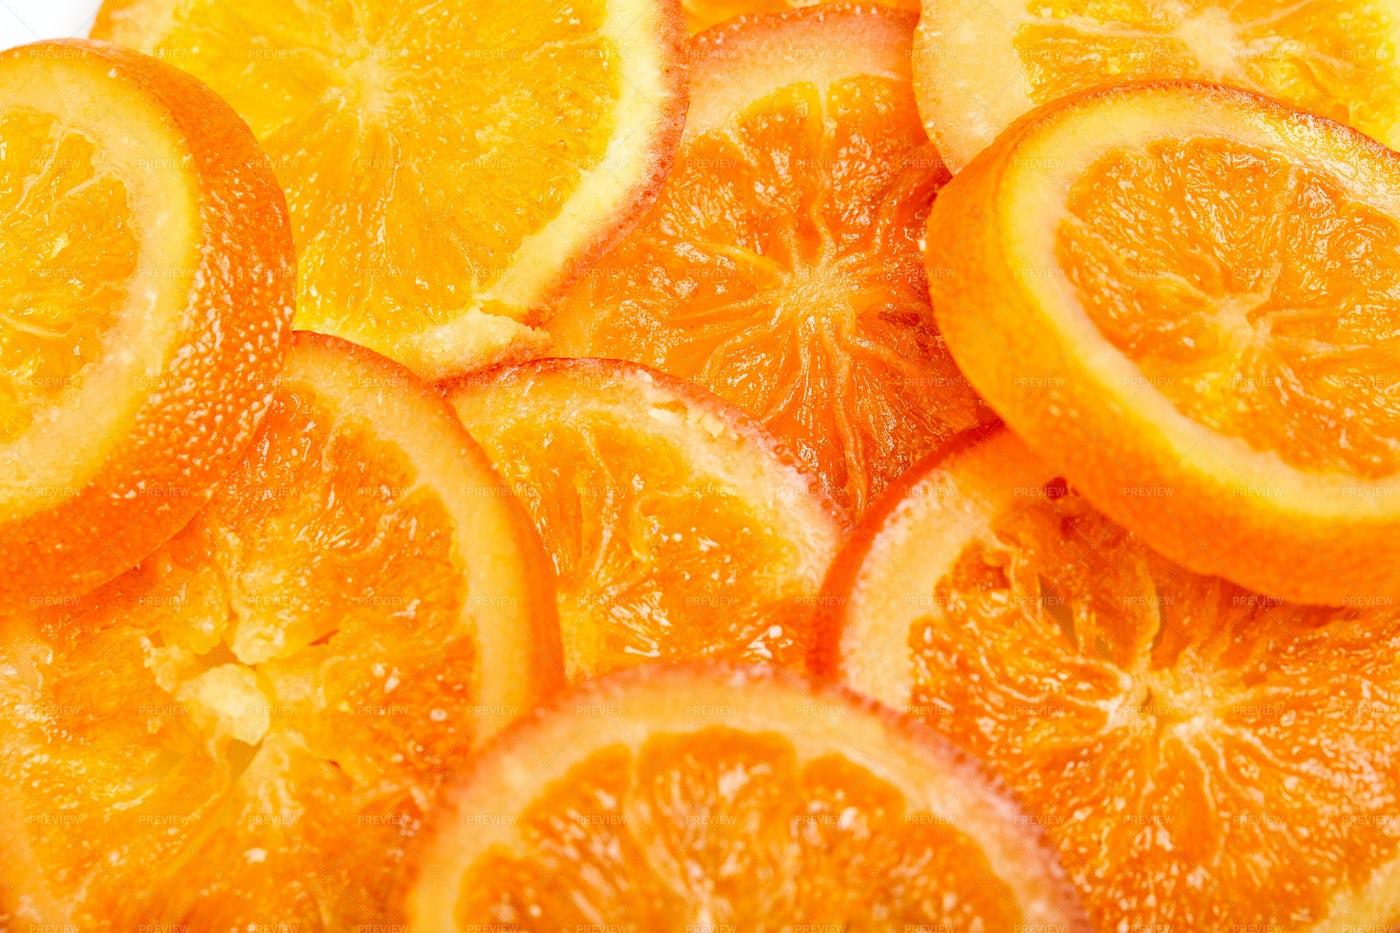 Collection Of Orange Slices: Stock Photos